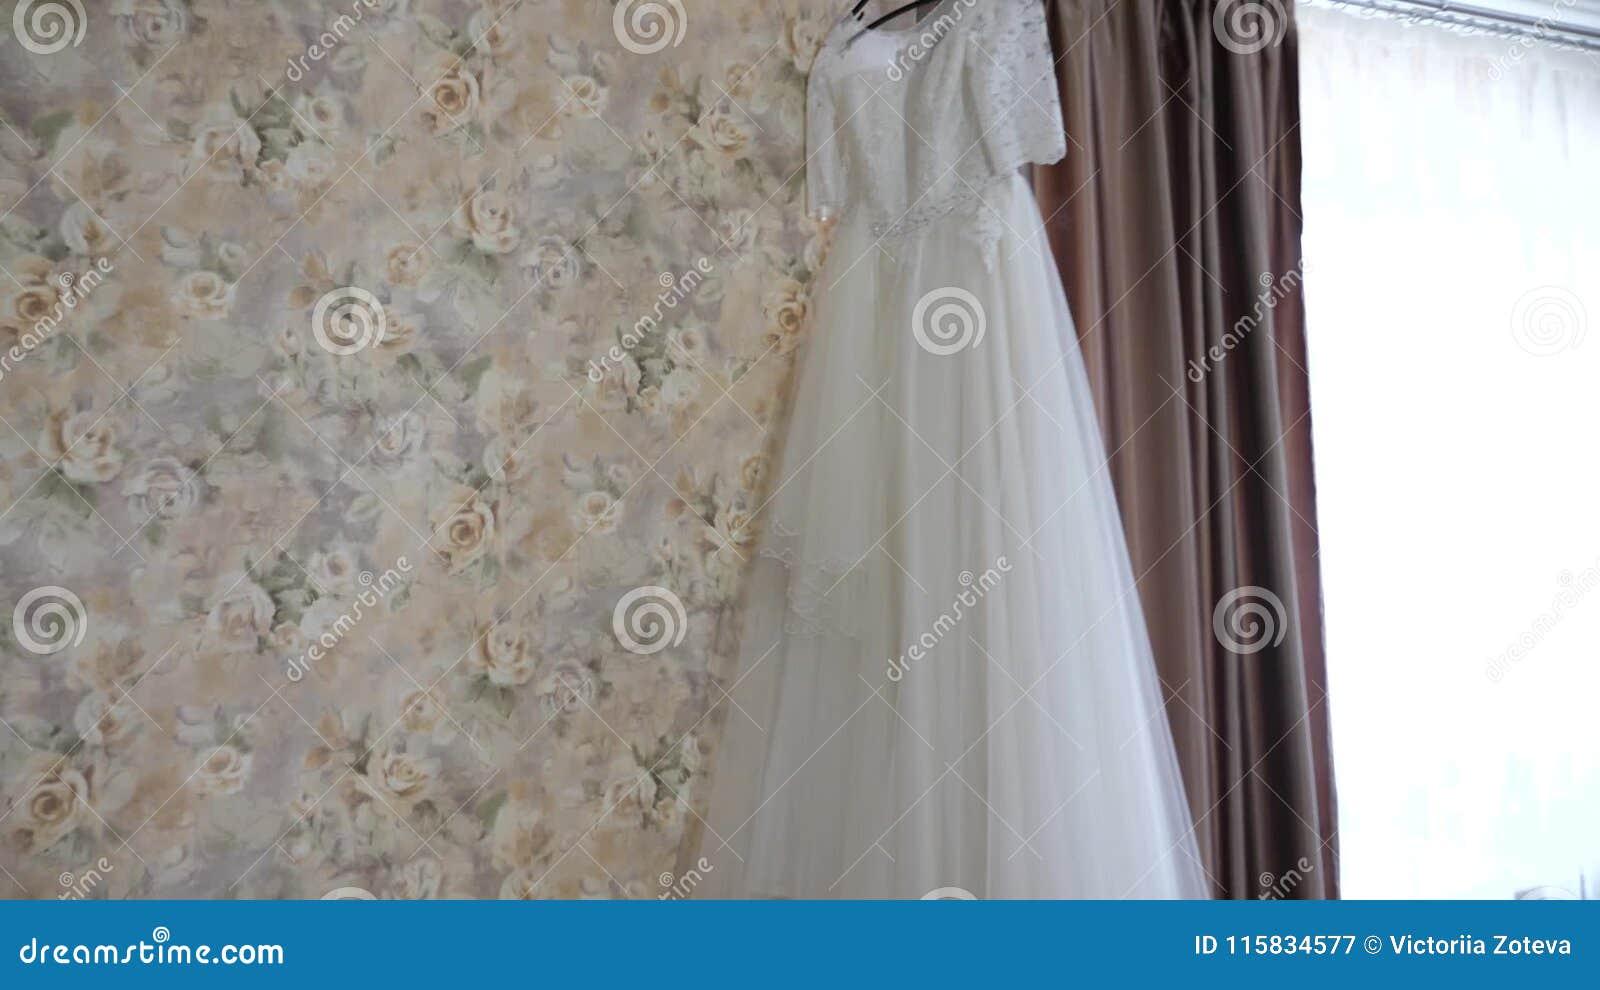 Beautiful White Wedding Dress Hanging On Hanger At The Window Stock ...